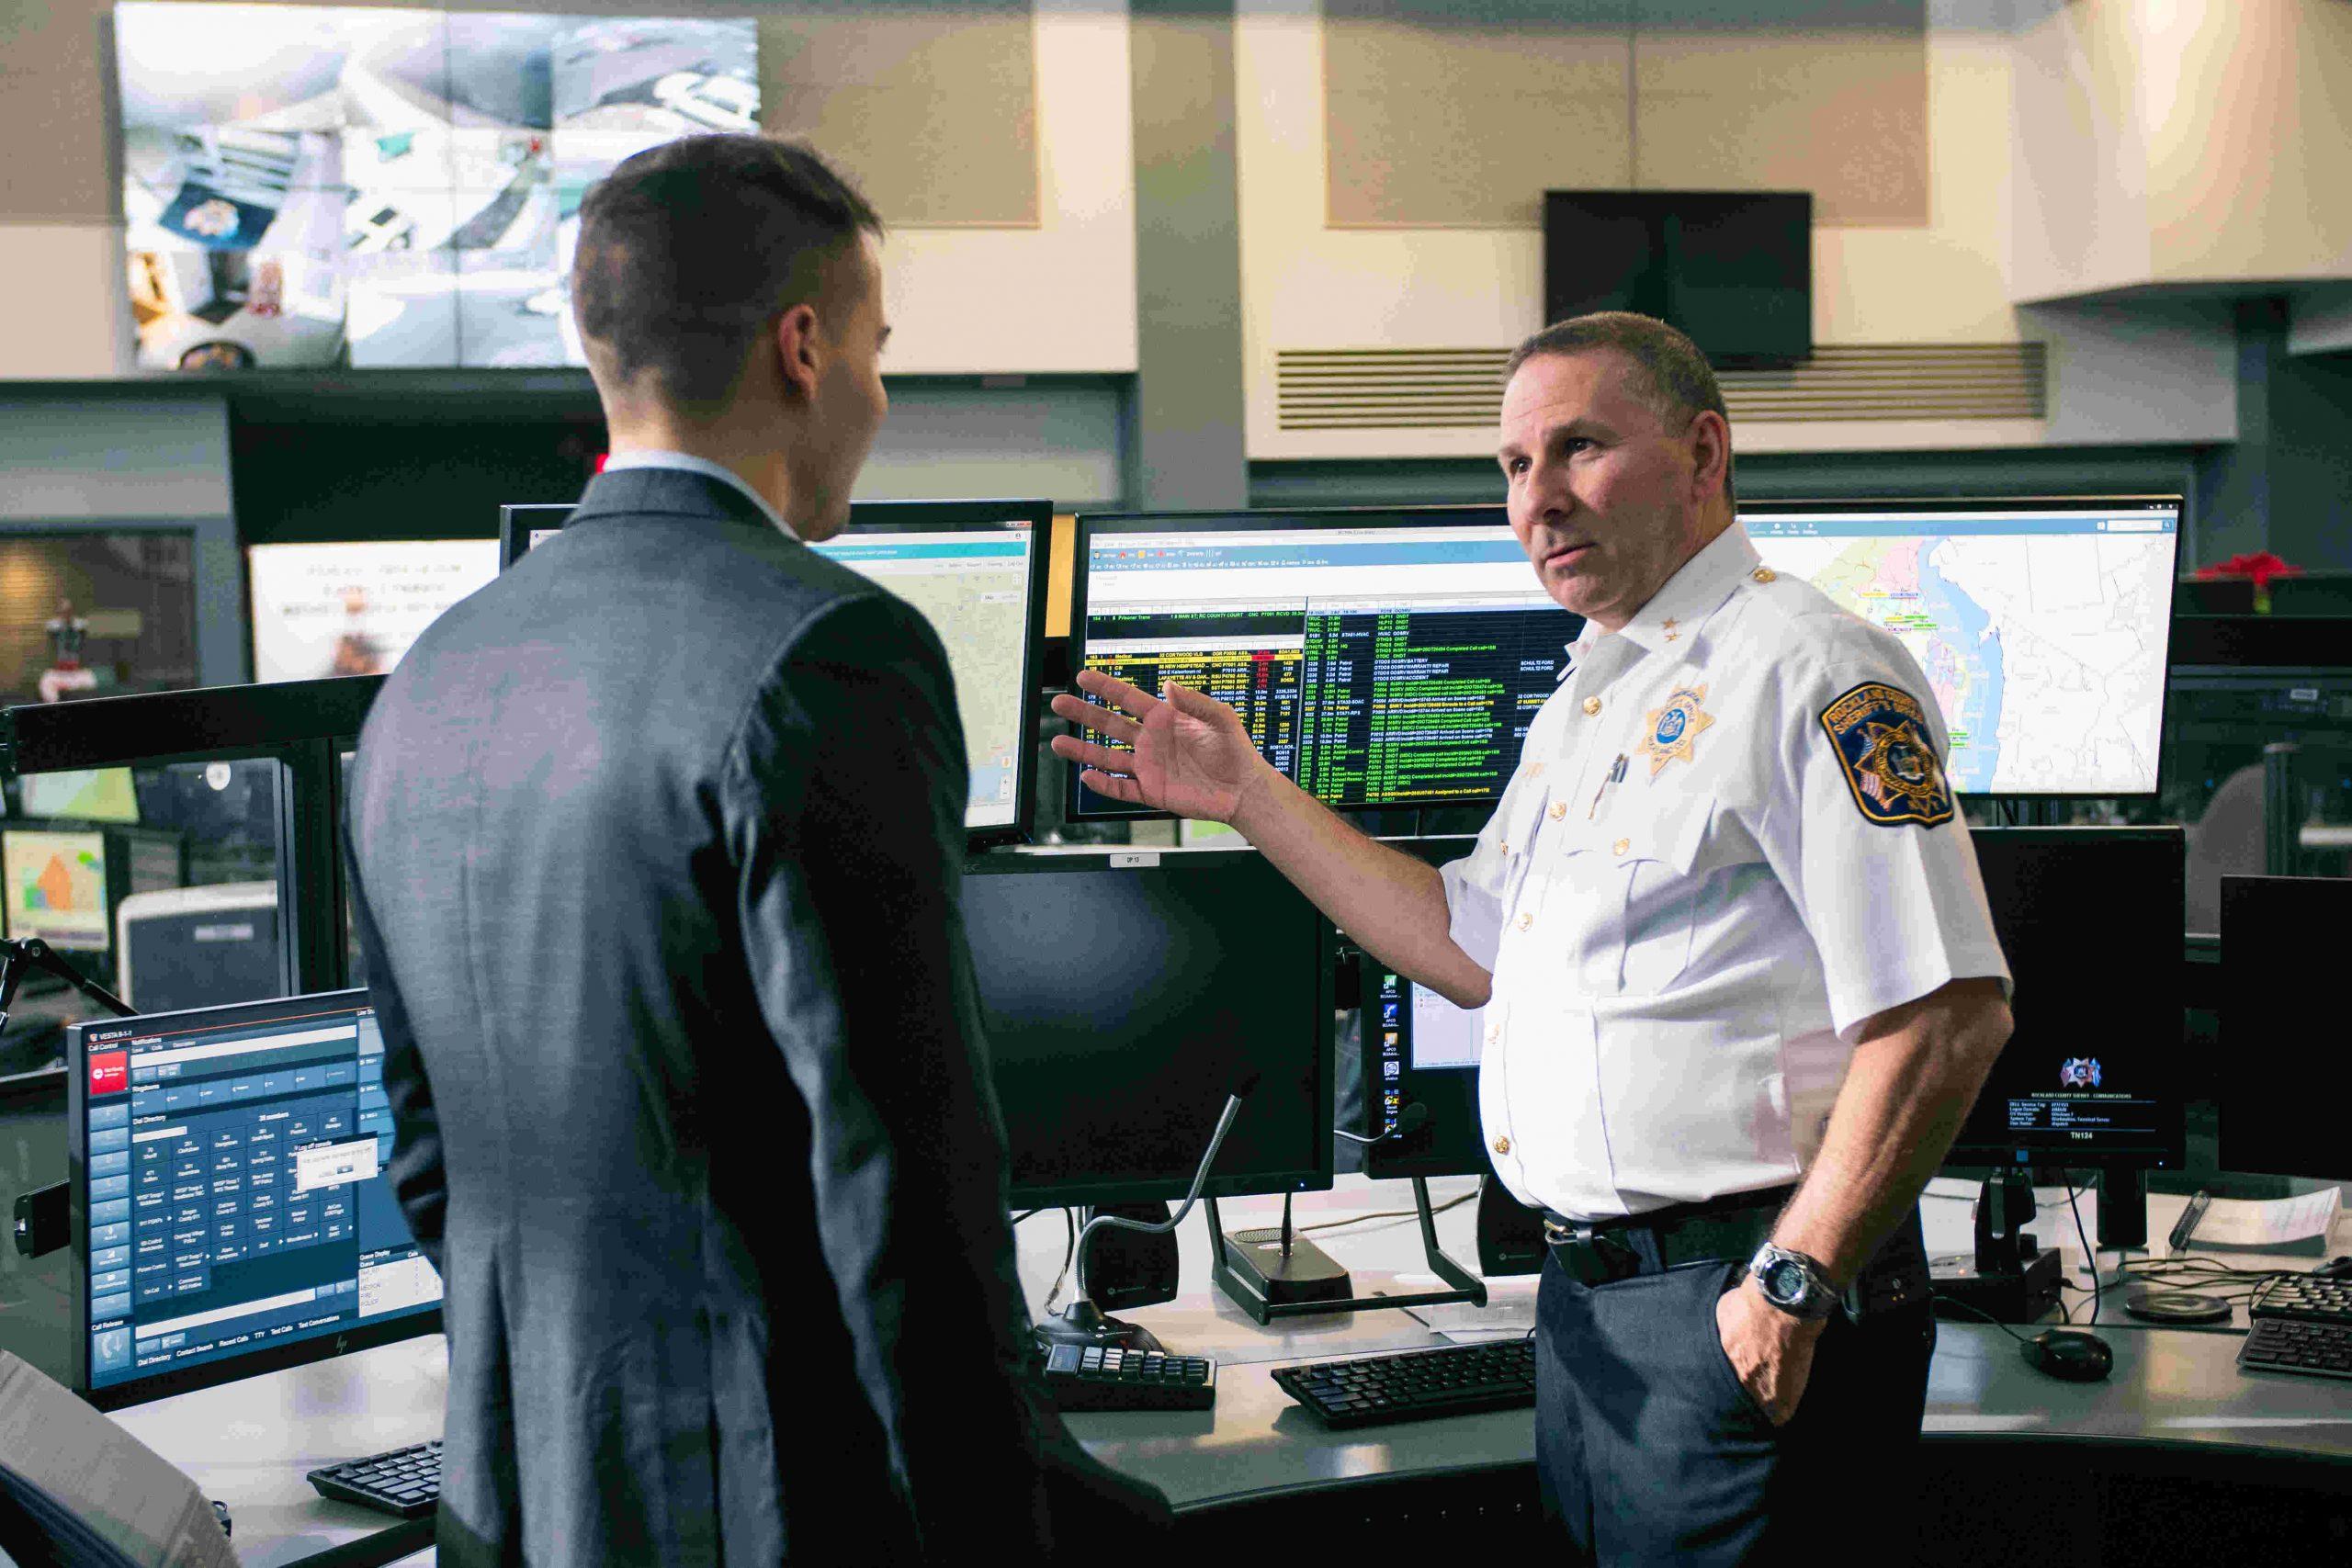 Michael Martin in an Emergency Communication Center